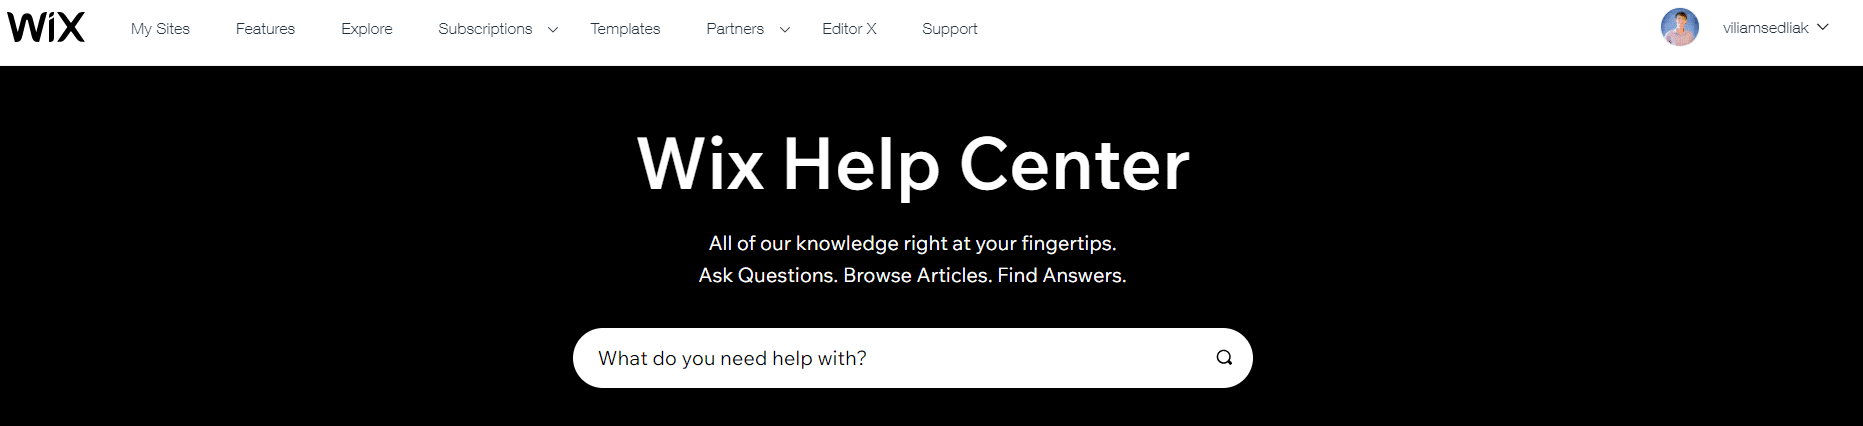 Wix - Recenze - Help Center - Ukazka